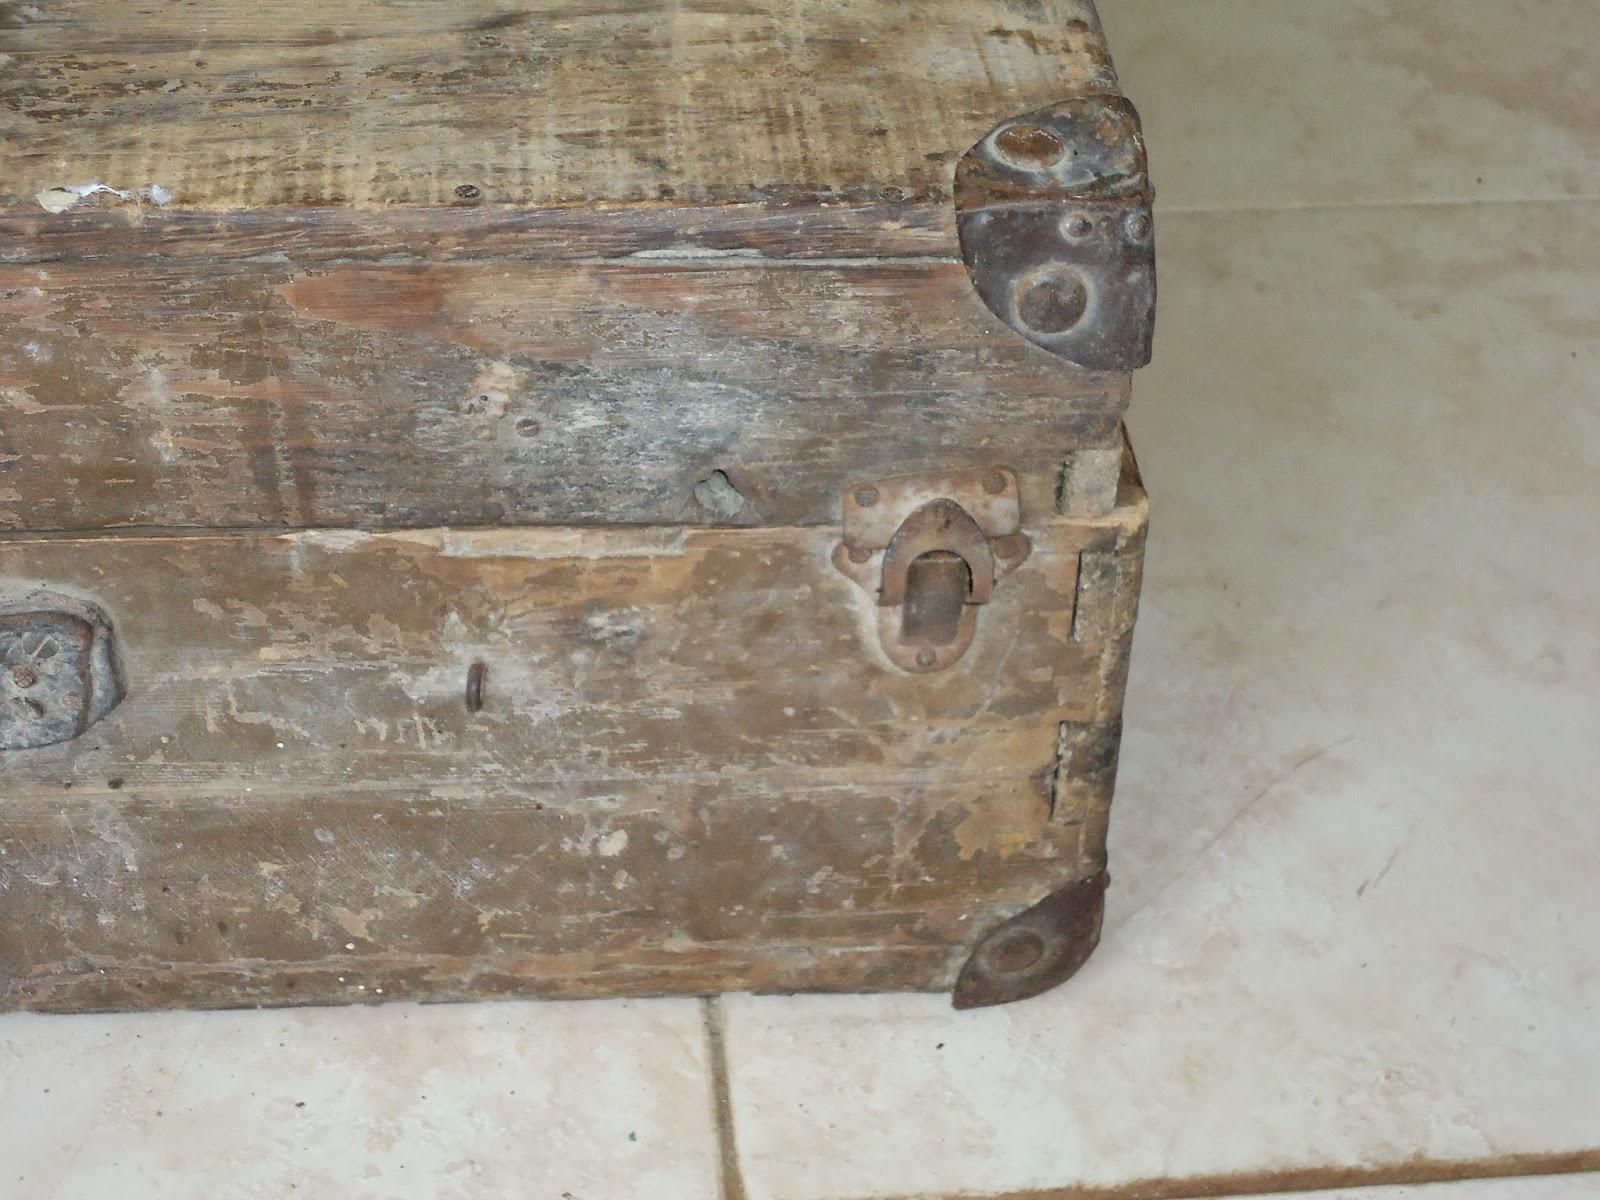 Restaurange maleta muy antigua - Tratar la carcoma ...